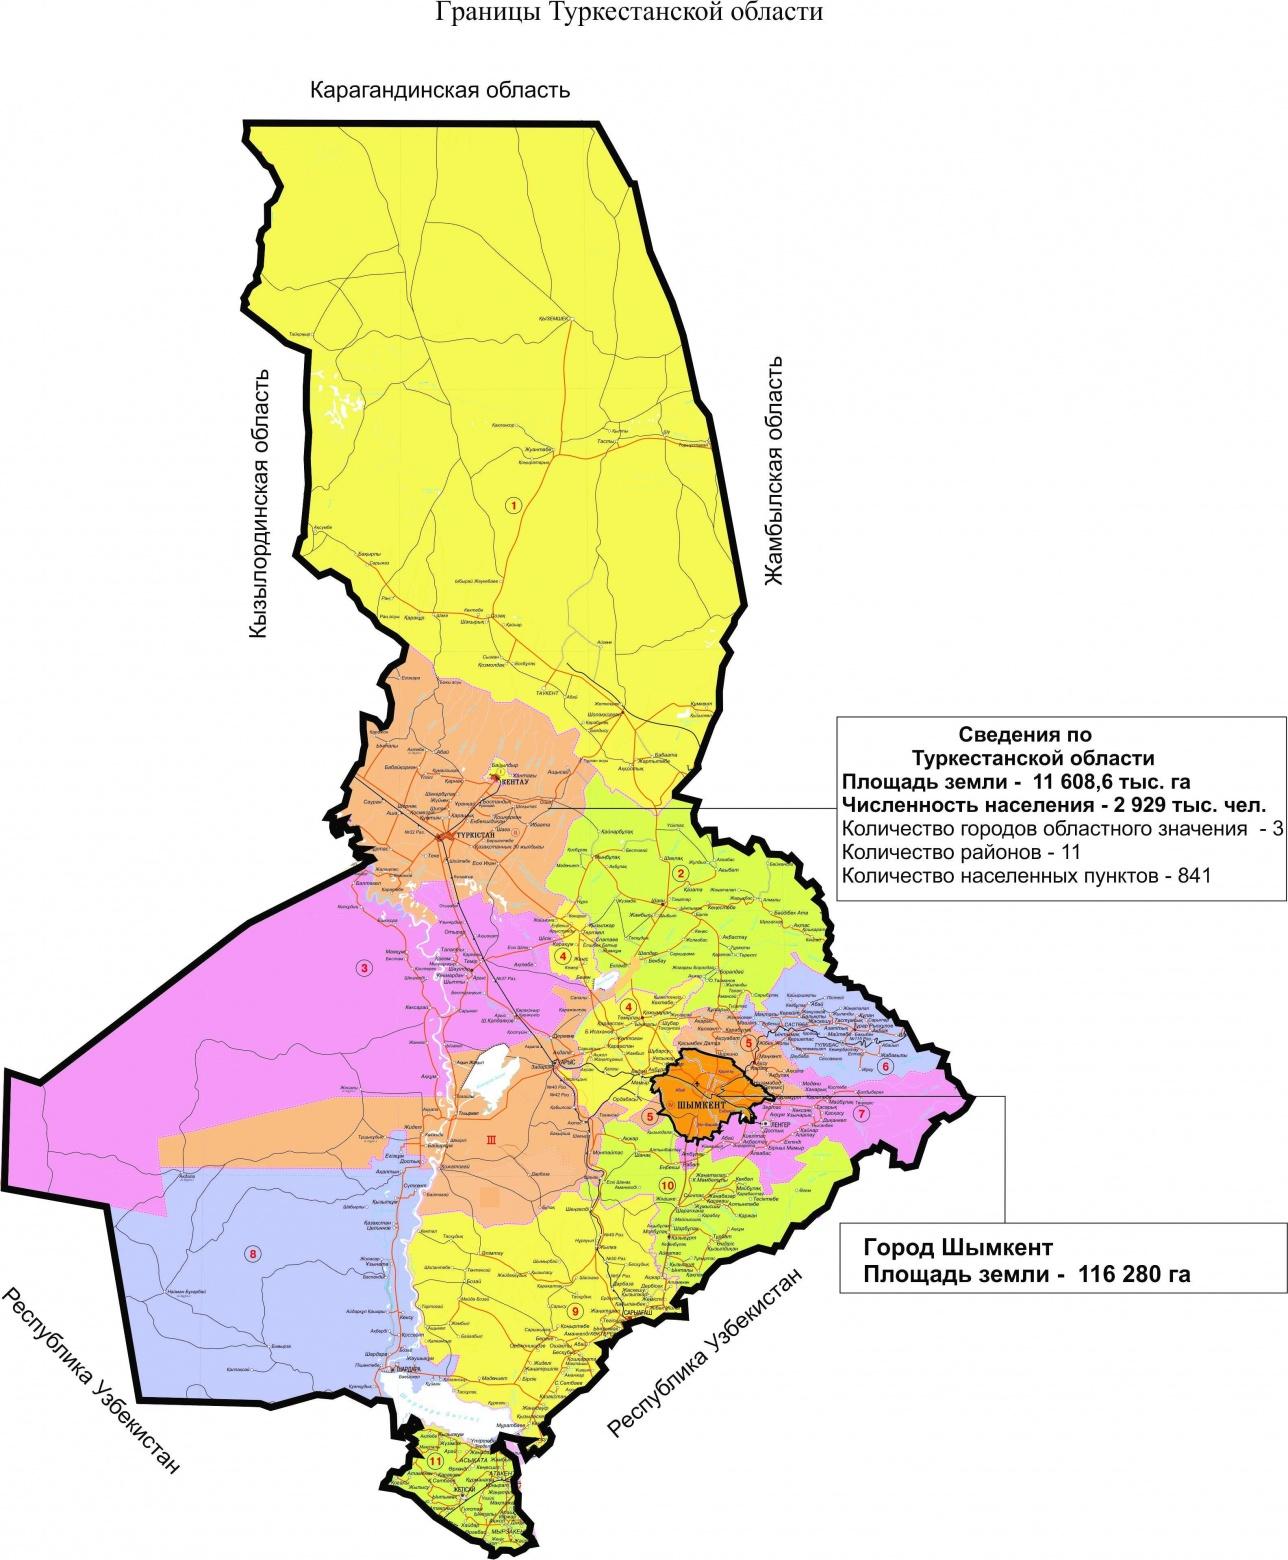 Схема границ Туркестанской области